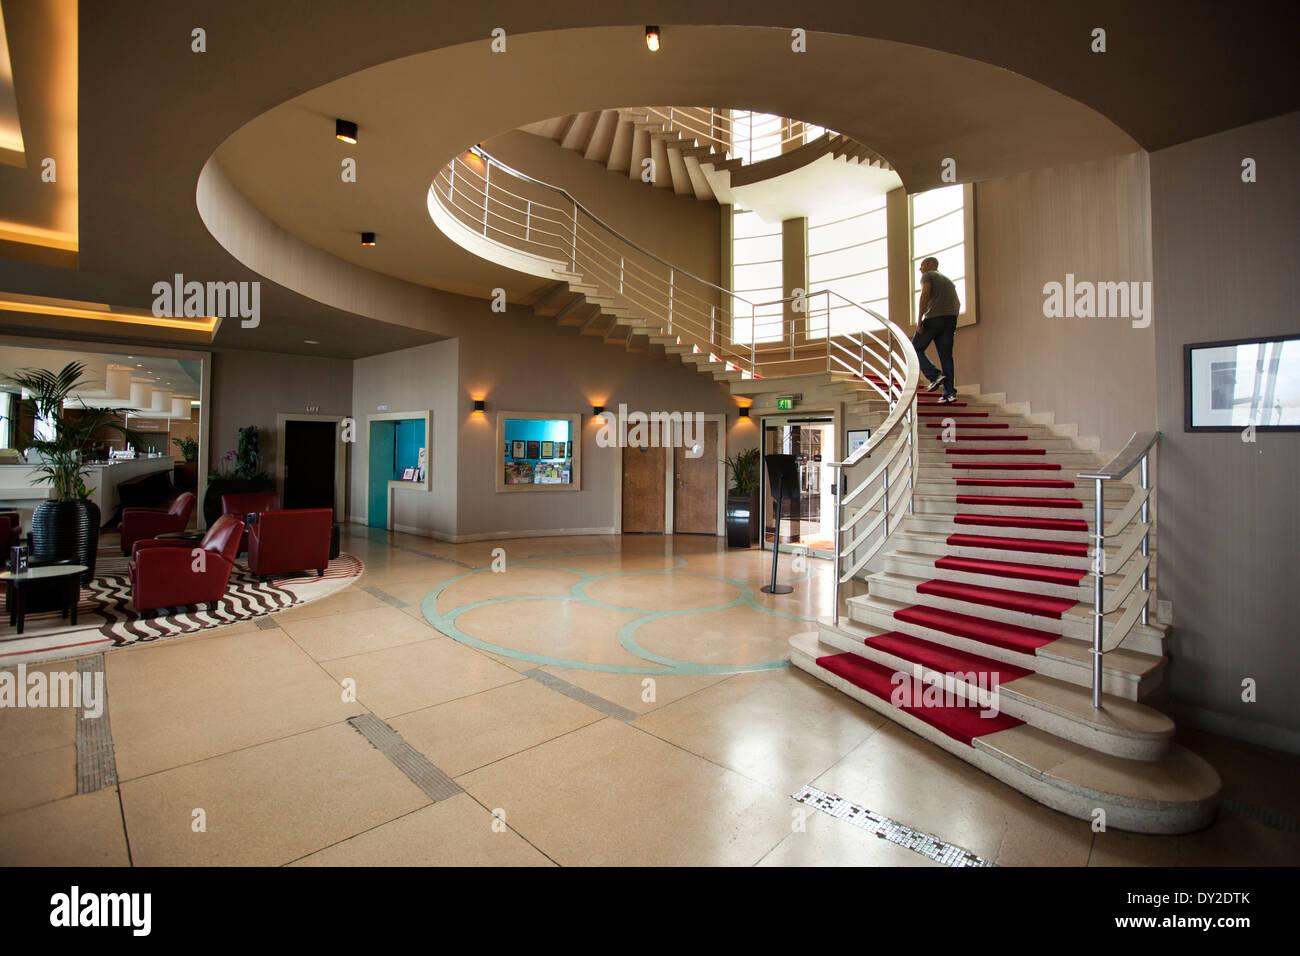 UK, England, Lancashire, Morecambe, Midland Hotel, Art Deco Circular  Stairwell In Entrance